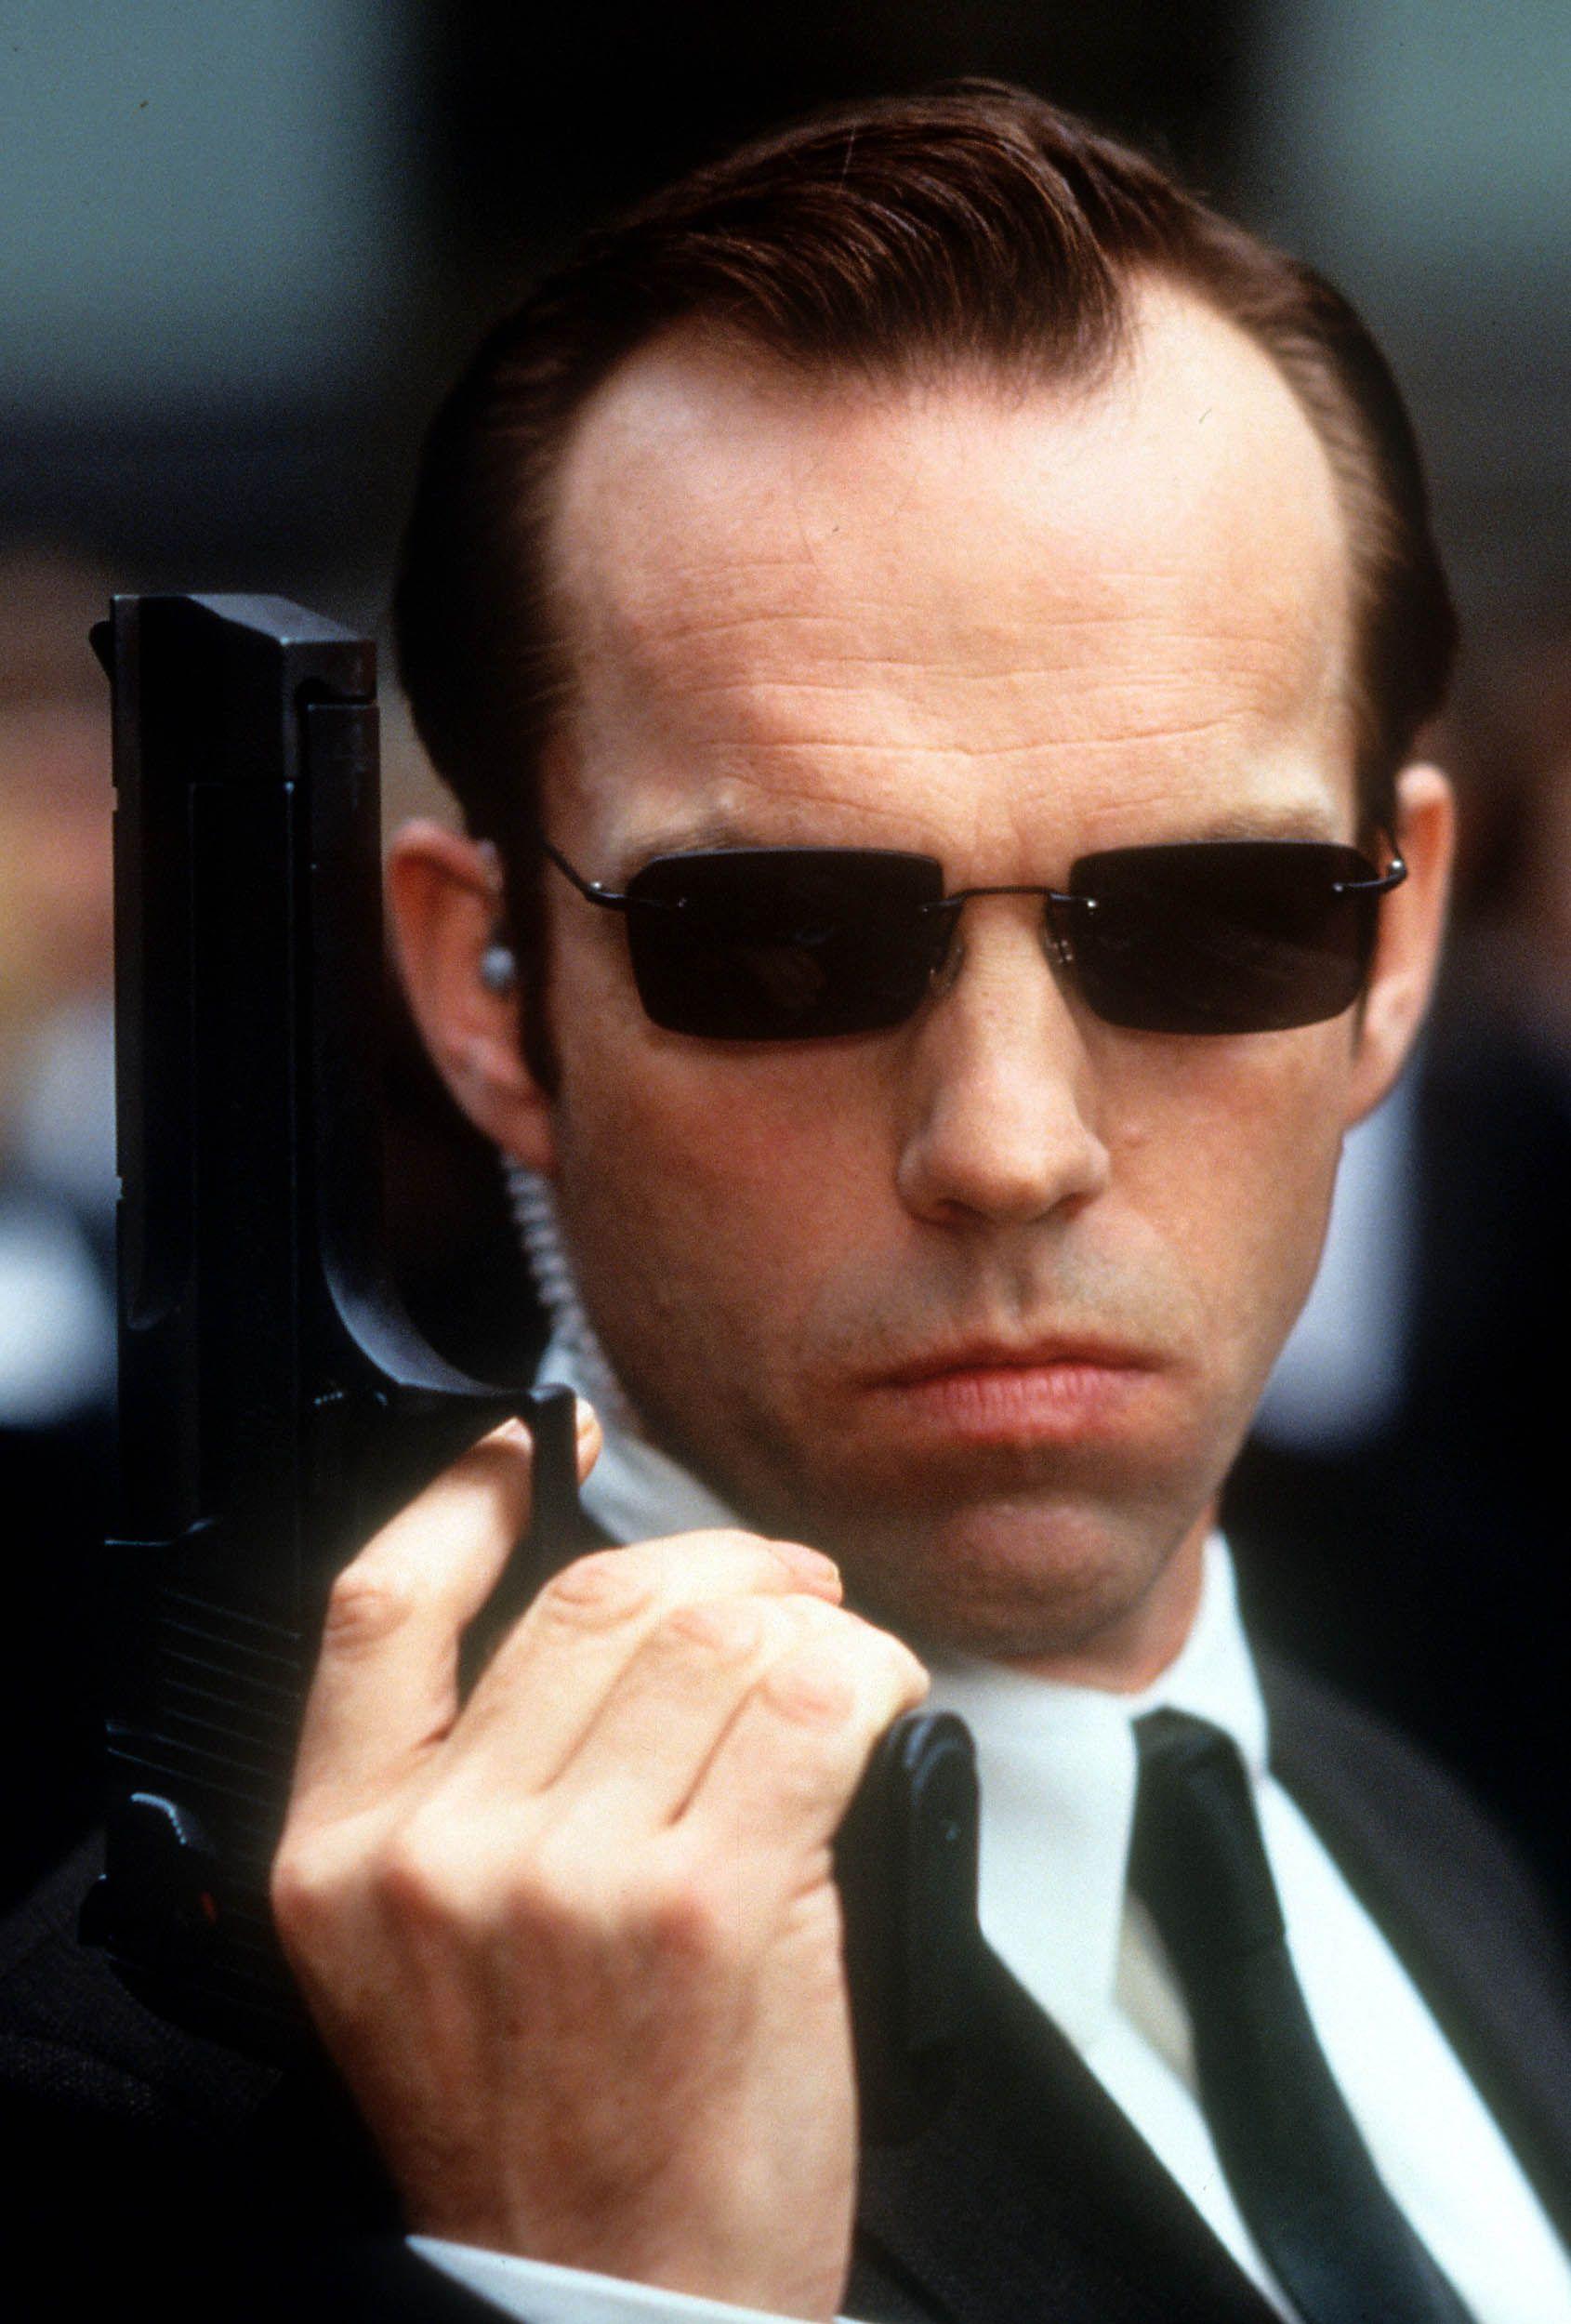 Hugo Weaving holding pistol in a scene from the 1999 film The Matrix.